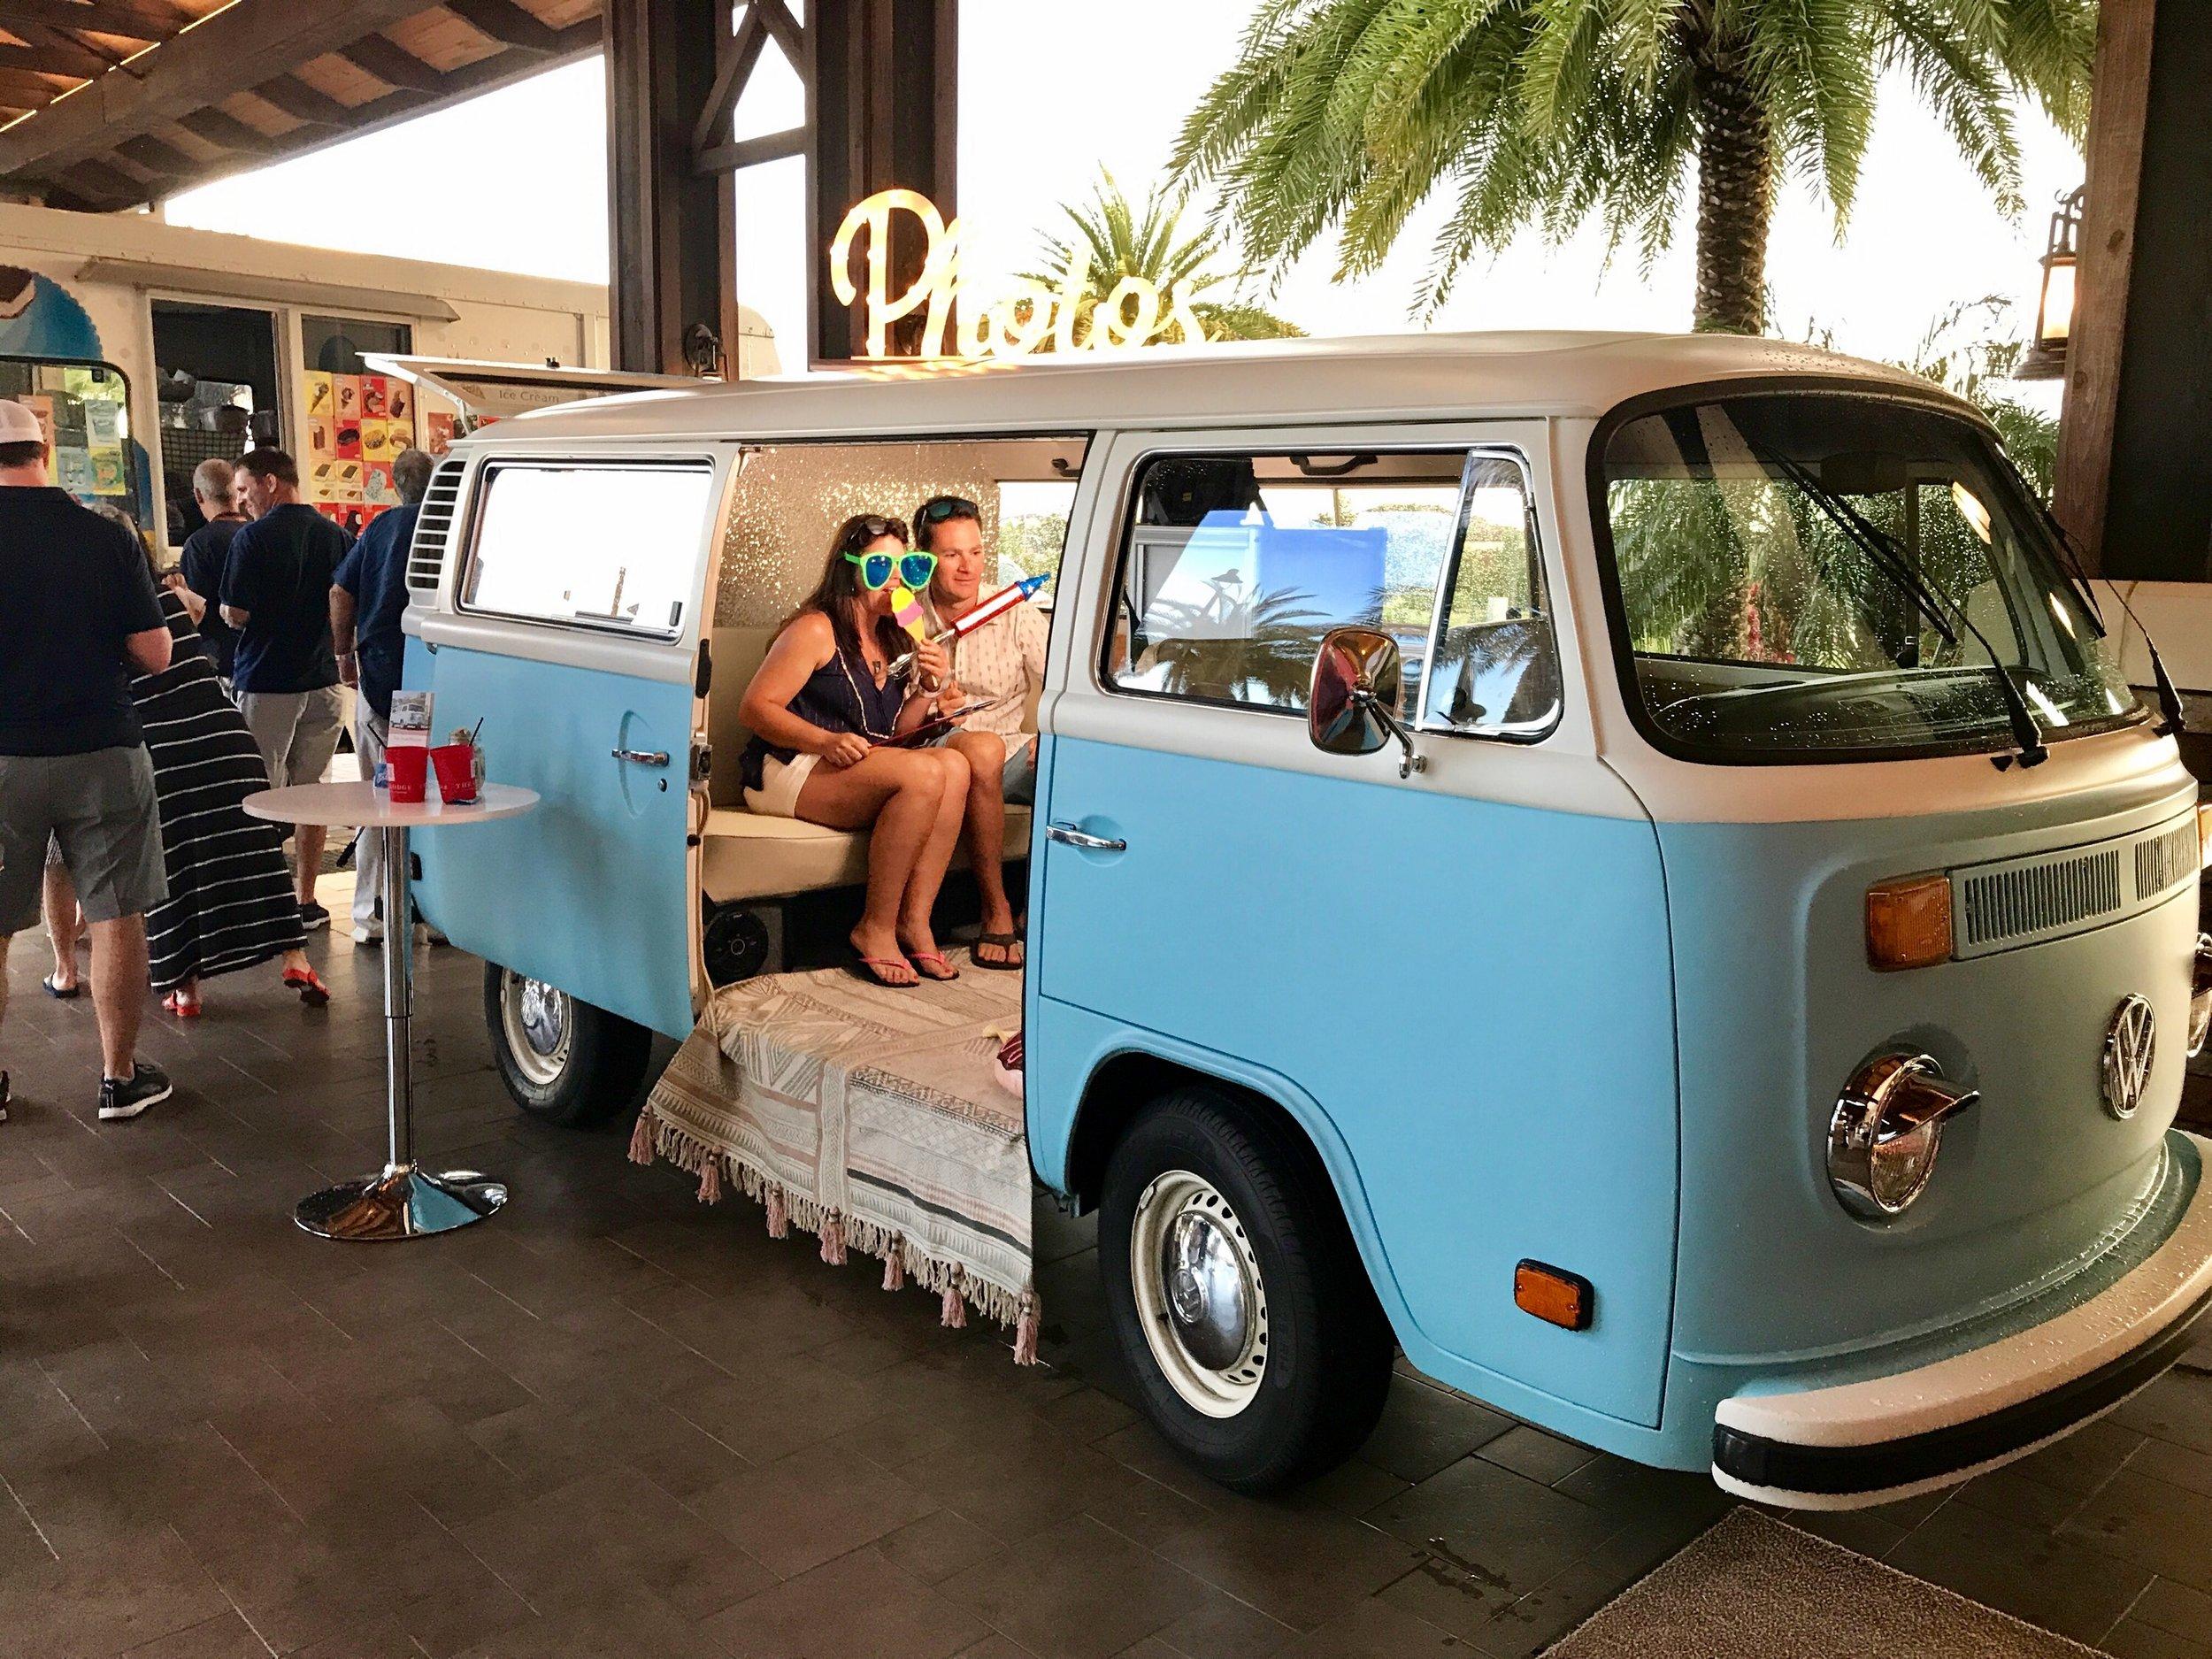 VW Photo Bus in Bradenton FL for a festival.